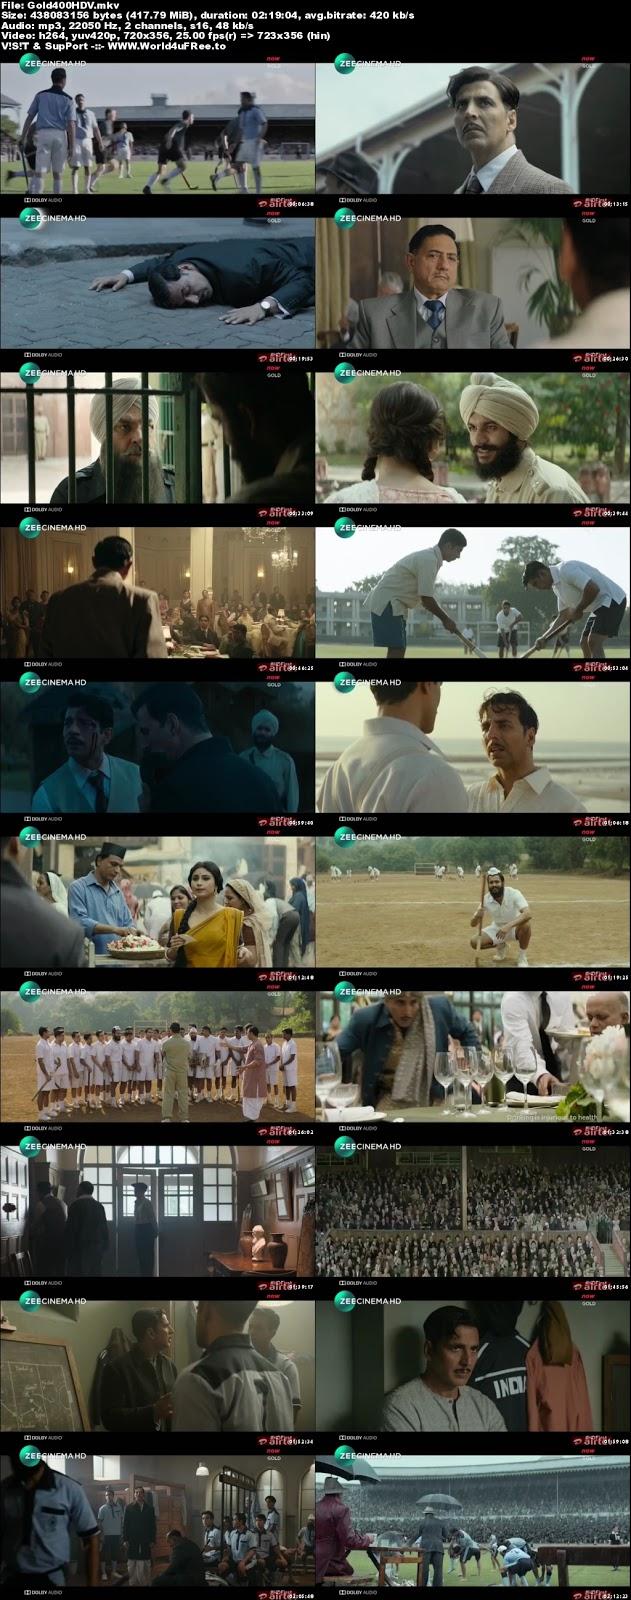 Gold 2018 Hindi Movie HDTV 480p 400Mb x264 world4ufree.vip , hindi movie Gold 2018 hdrip 720p bollywood movie Gold 2018 720p LATEST MOVie Gold 2018 720p DVDRip NEW MOVIE Gold 2018 720p WEBHD 700mb free download or watch online at world4ufree.vip